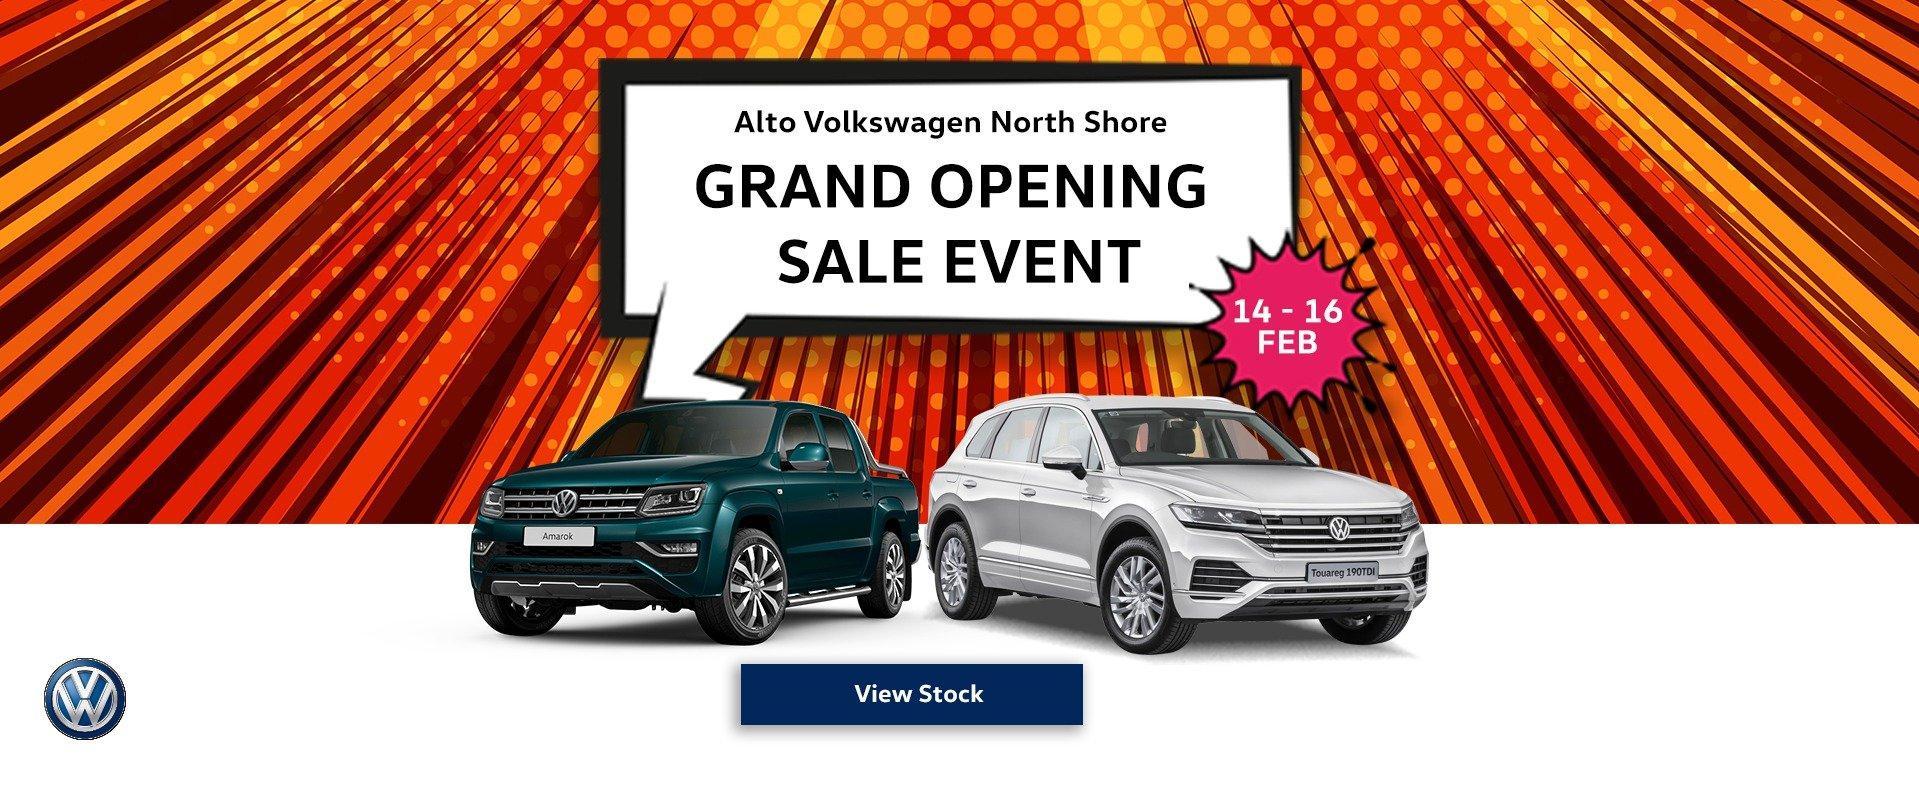 Alto Volkswagen North Shore Grand Opening